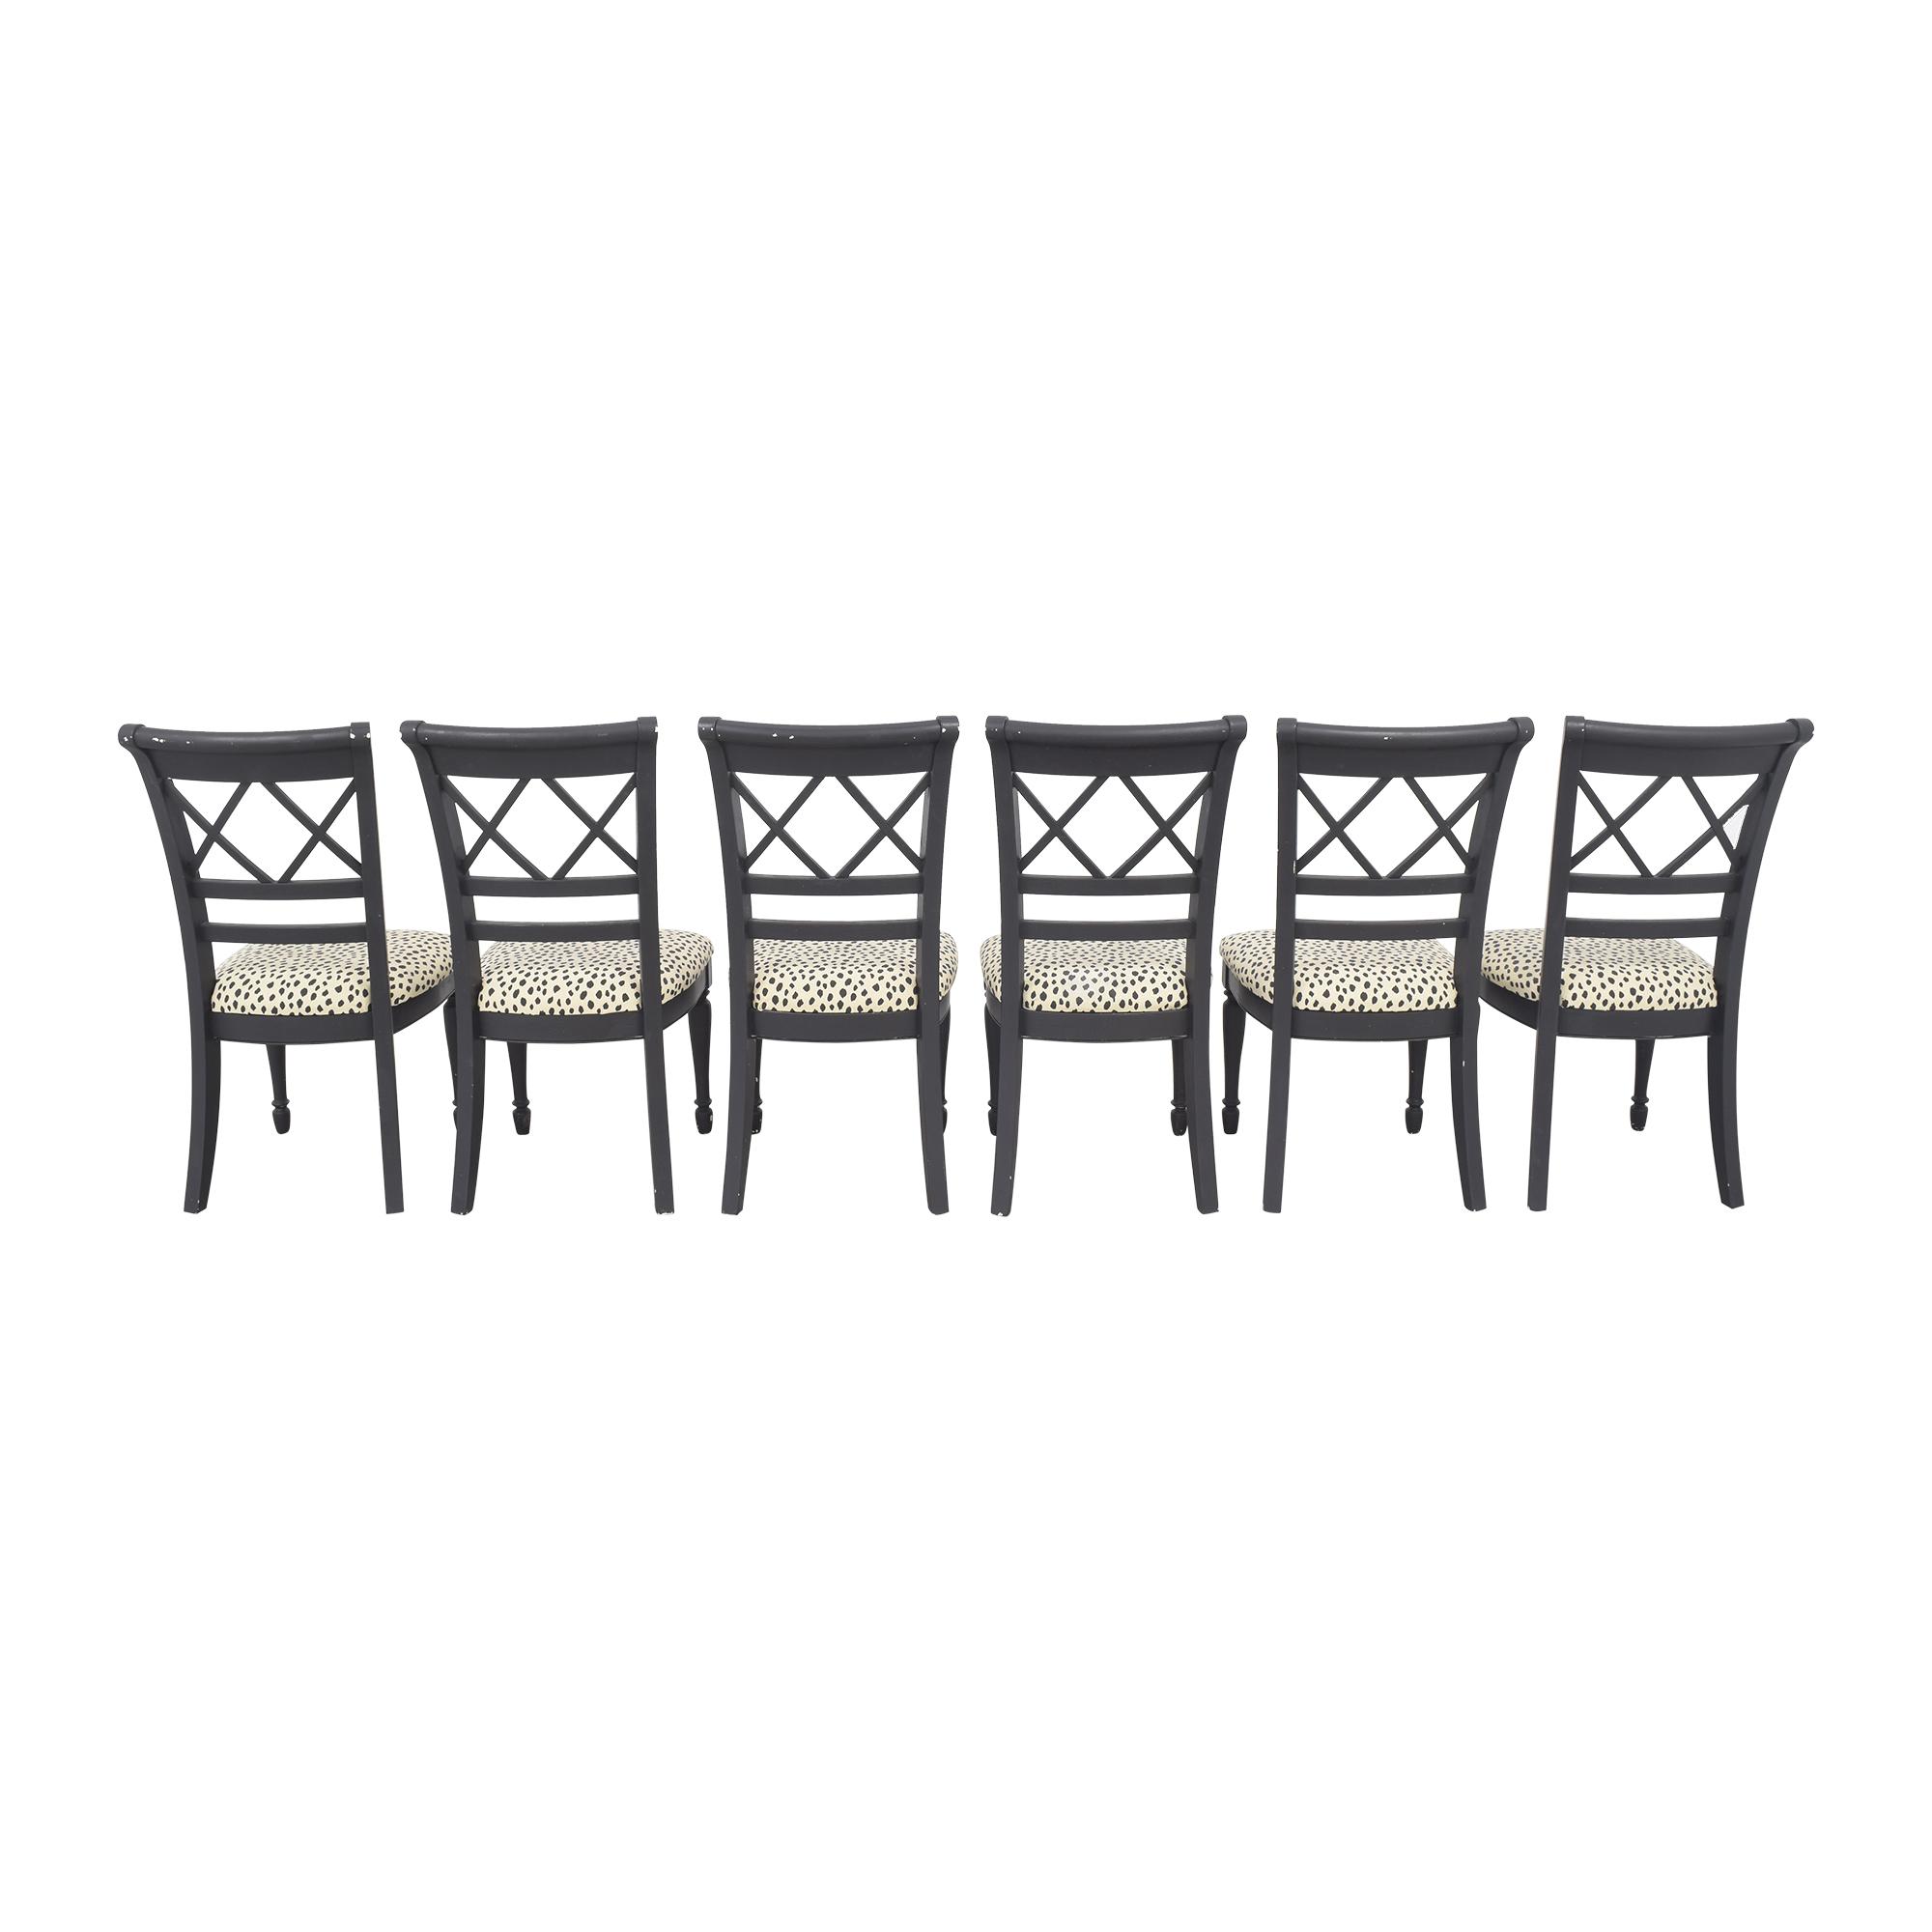 Cresent Furniture Cresent Fine Furniture Dining Chairs black, white